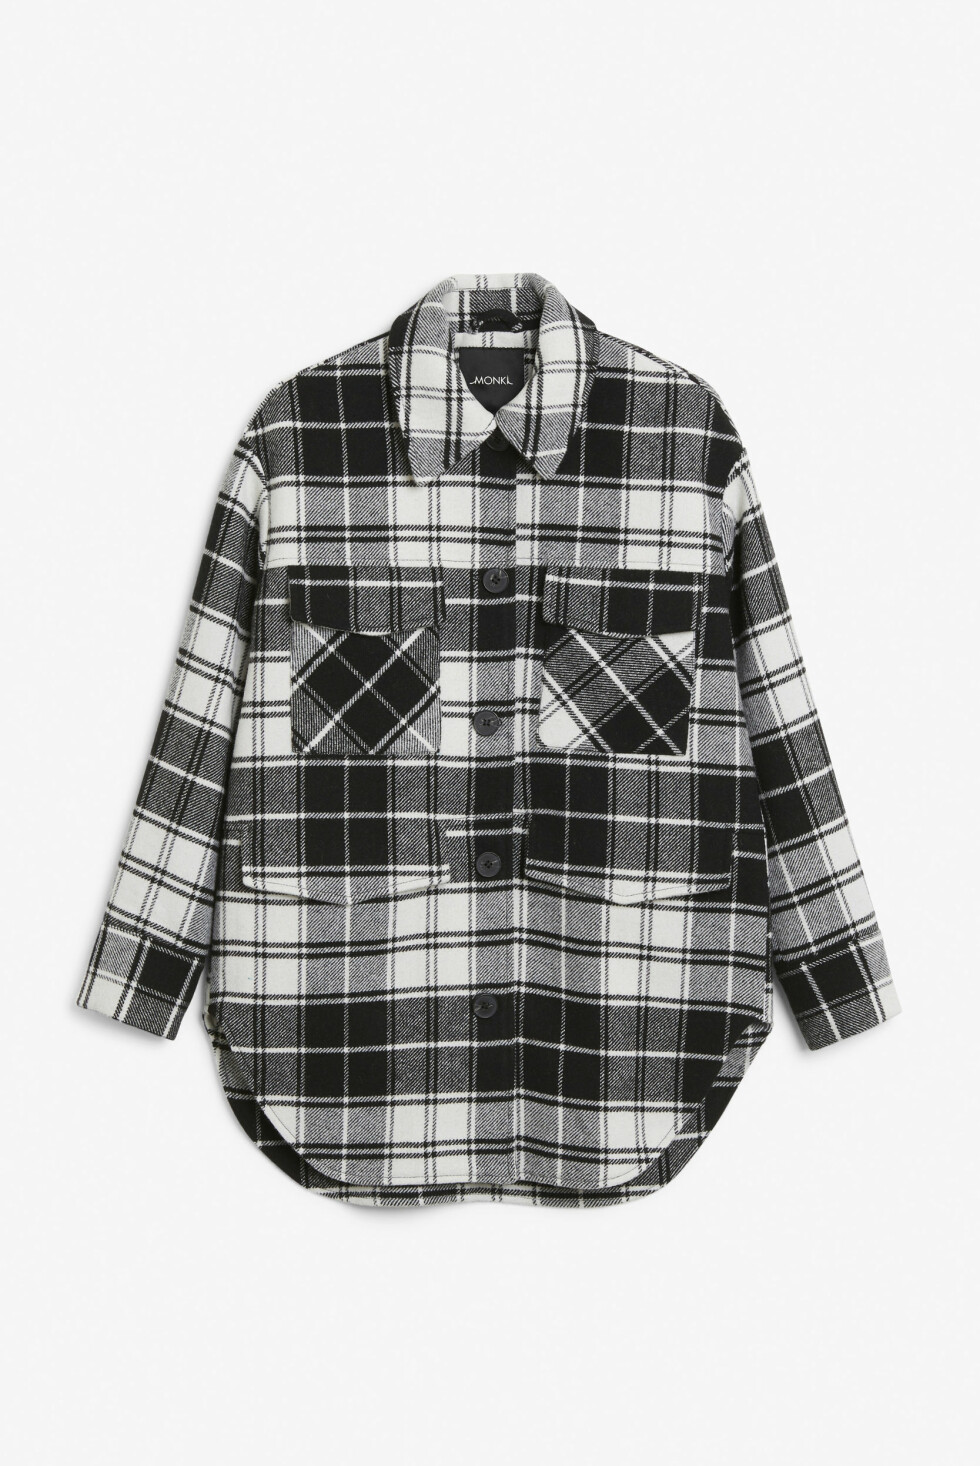 Rutete skjorte (kr 200, Monki).